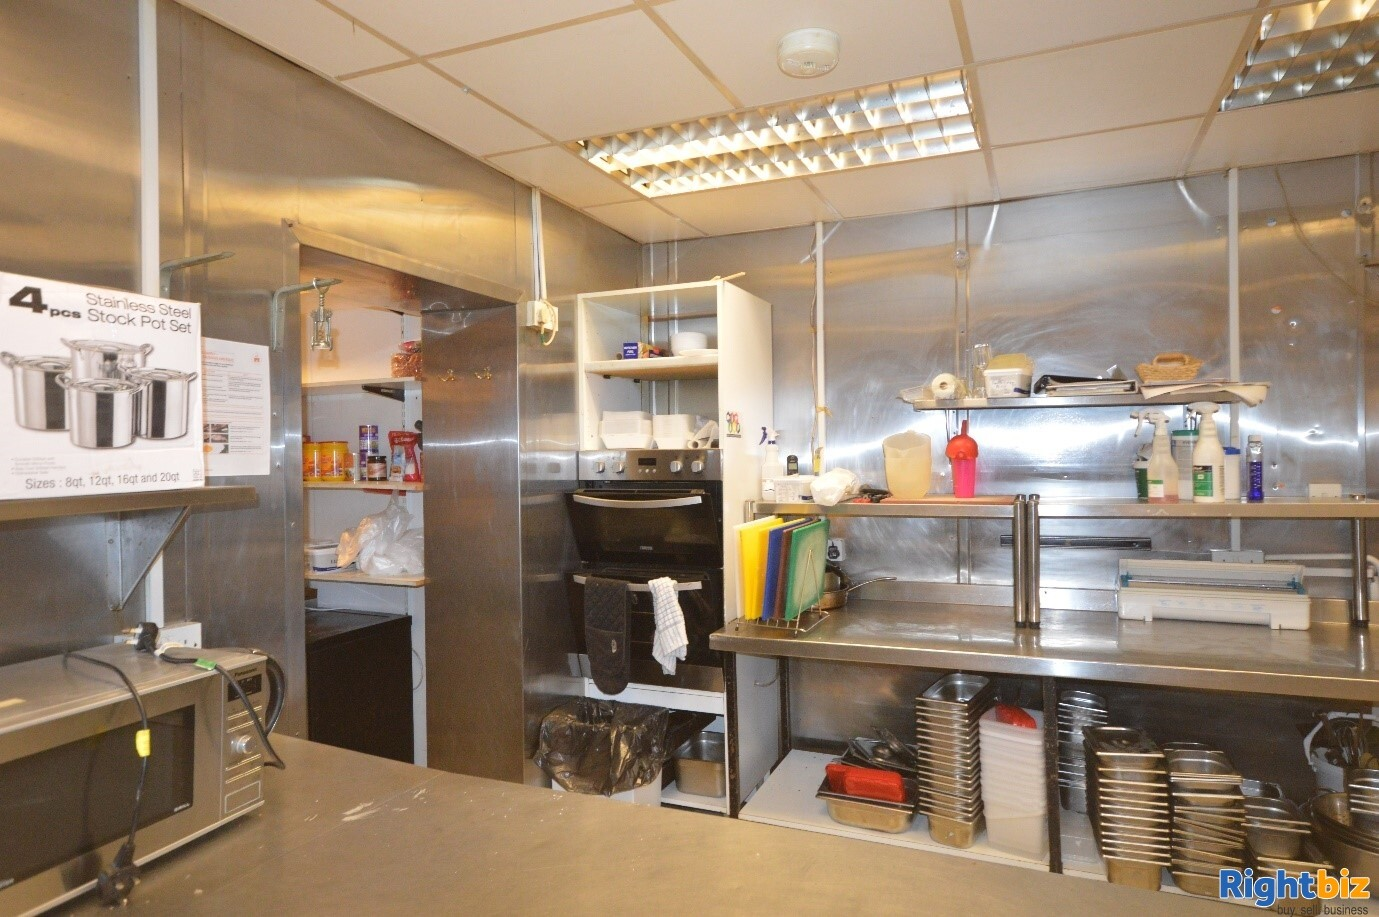 Full Class 3 hot food takeaway in Edinburgh city centre (ref 1396) - Image 7